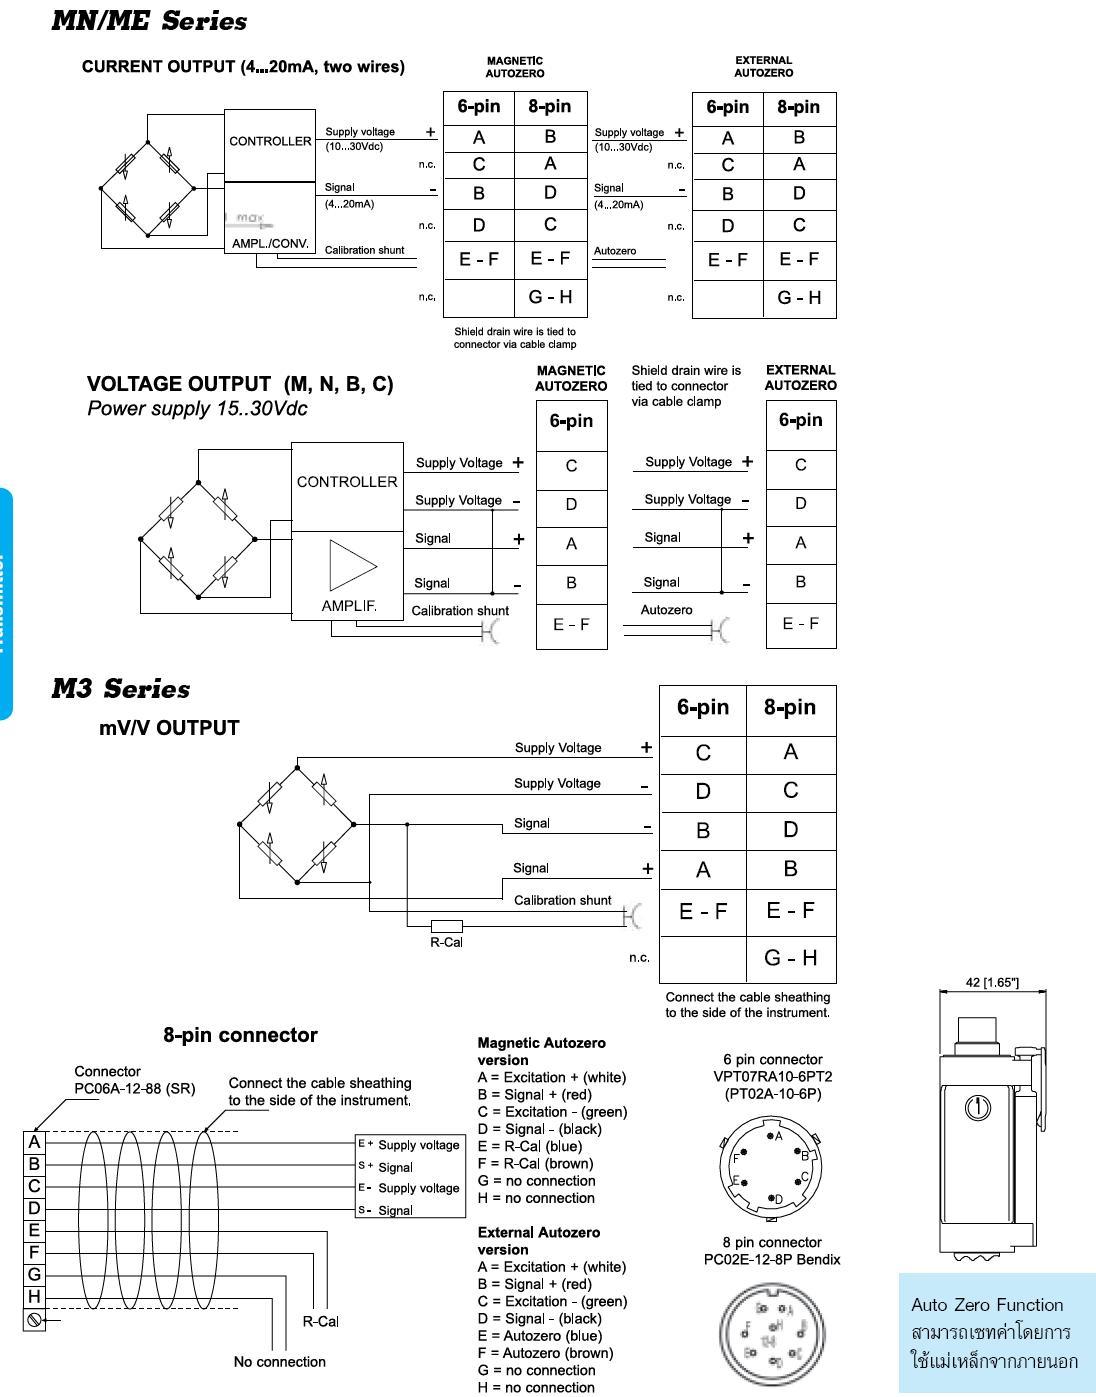 M Series Melt Pressure Transducer 3 gefran pressure transducer wiring diagram wiring diagram and gems pressure transducer wiring diagram at reclaimingppi.co